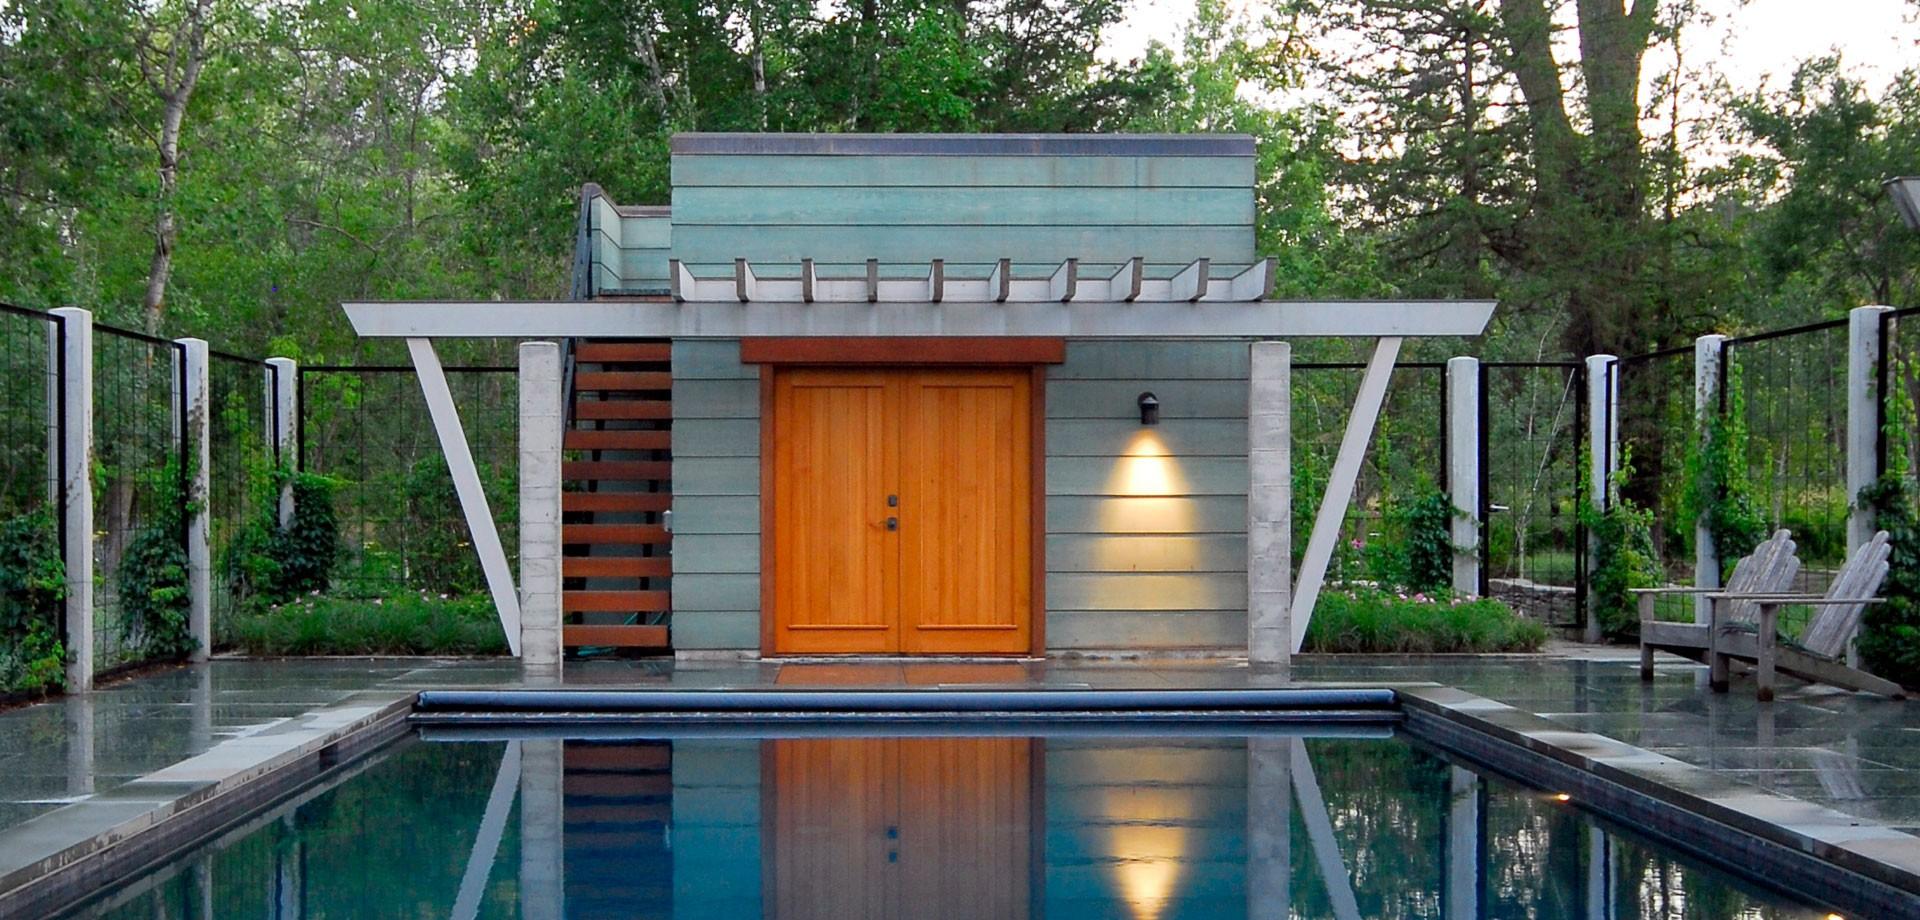 Sala architects salaarchitects twitter home design for Granite city topix